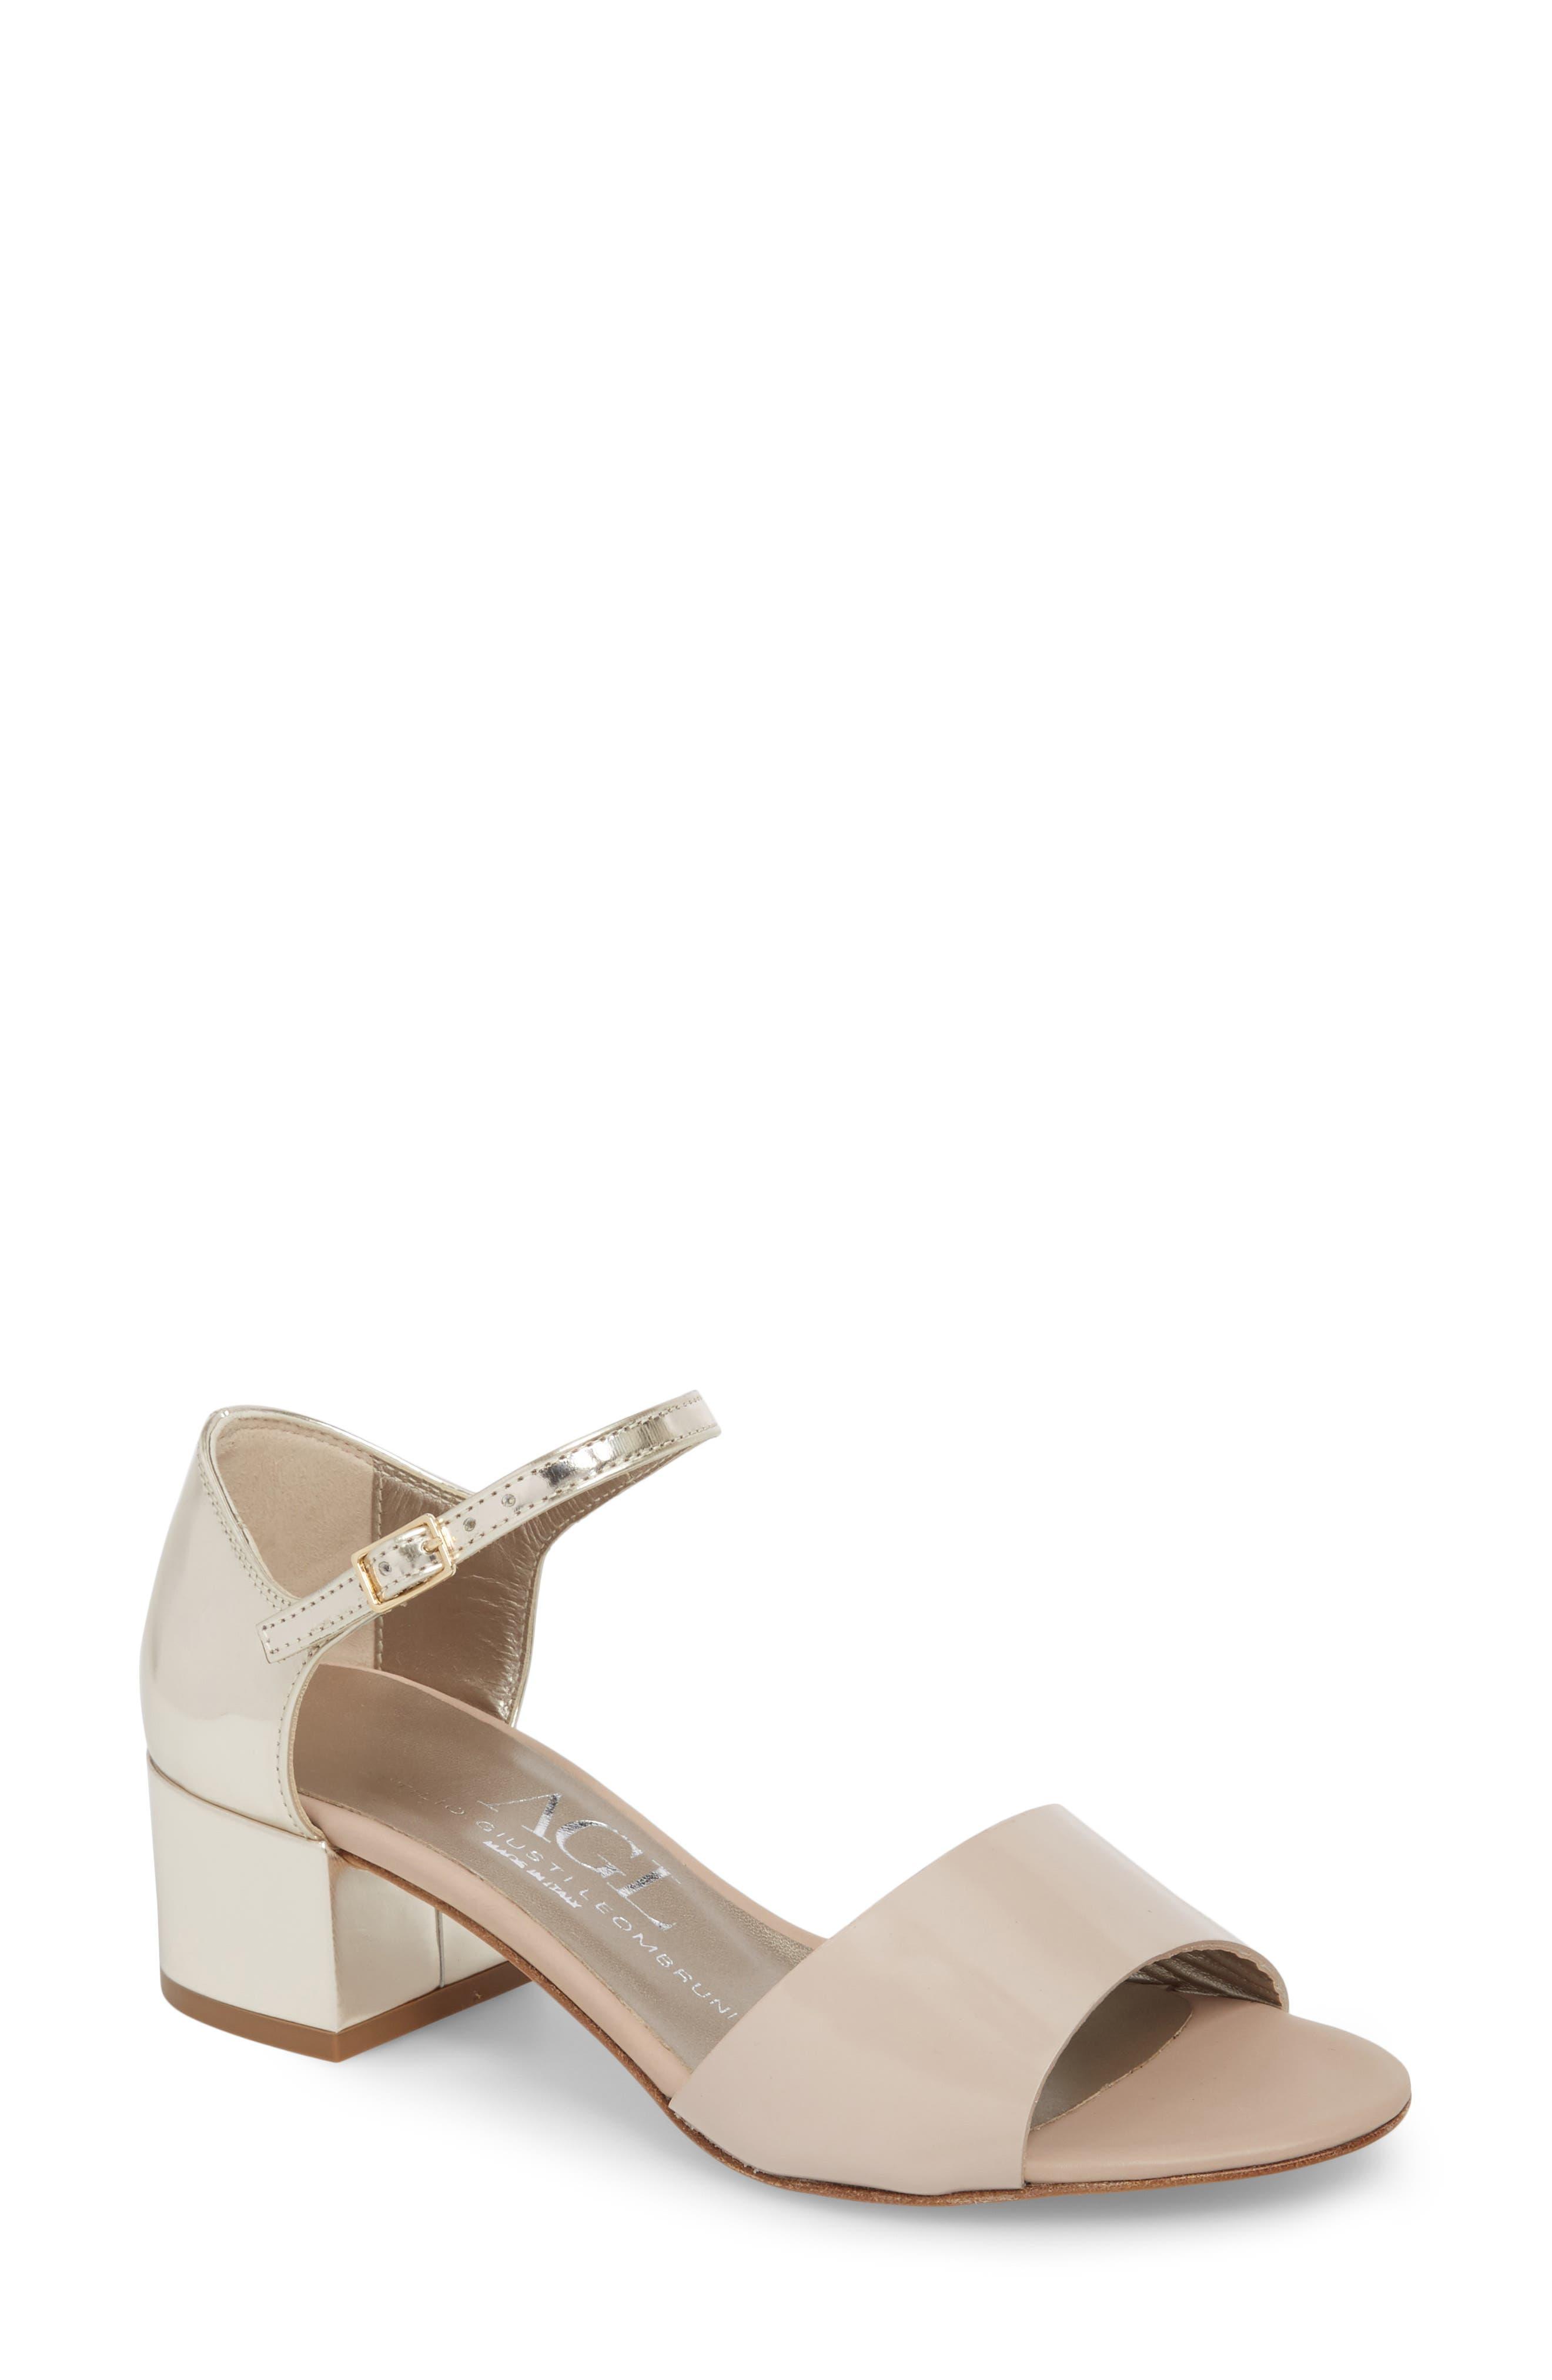 Main Image - AGL Quarter Strap Sandal (Women)